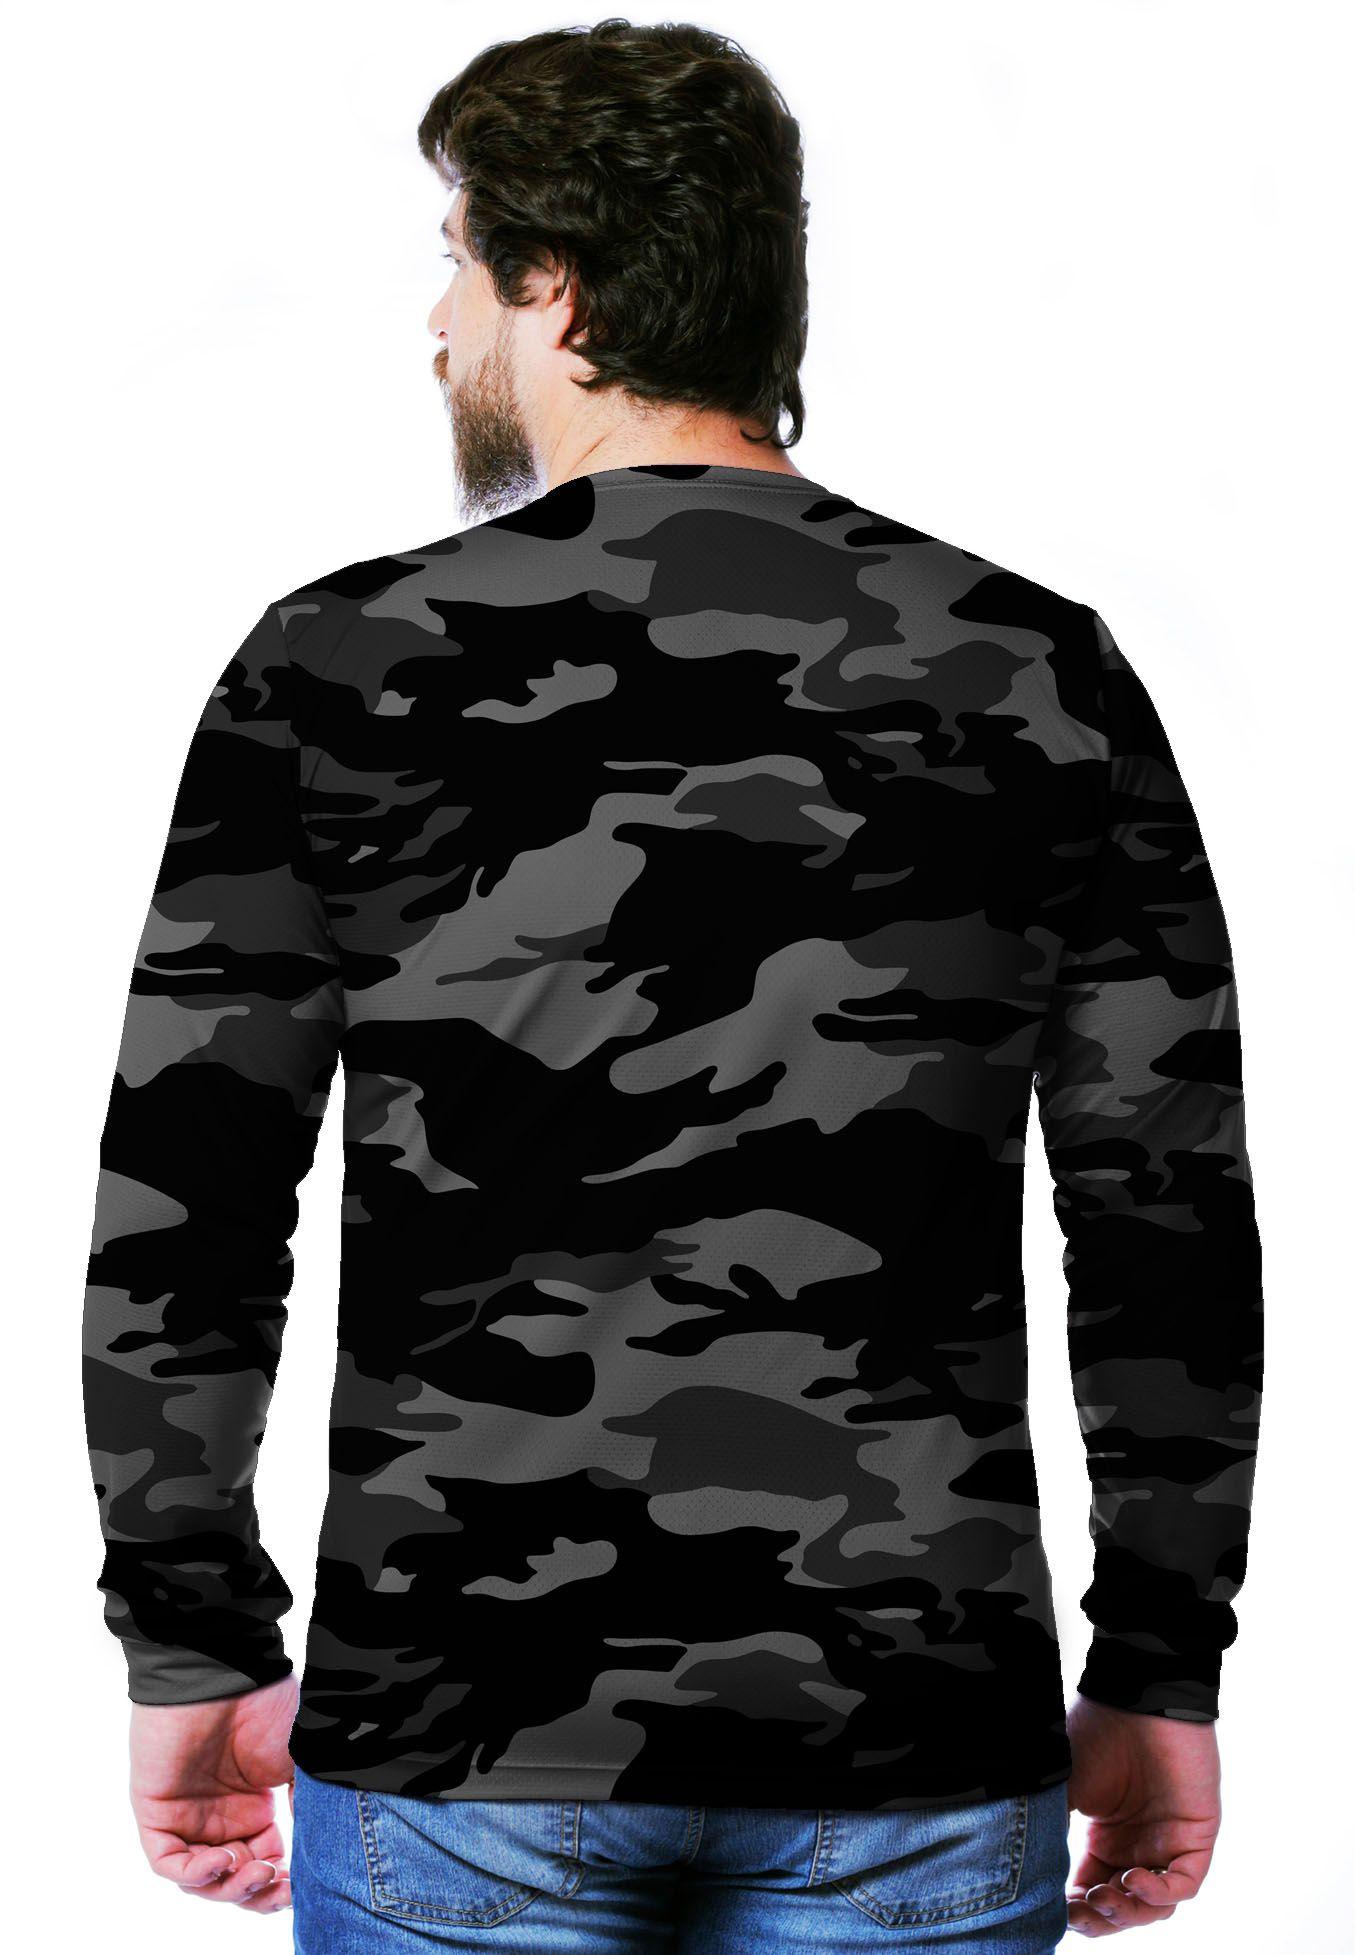 Camiseta  Camuflada Urbano Black Longa Masculina  - REAL HUNTER